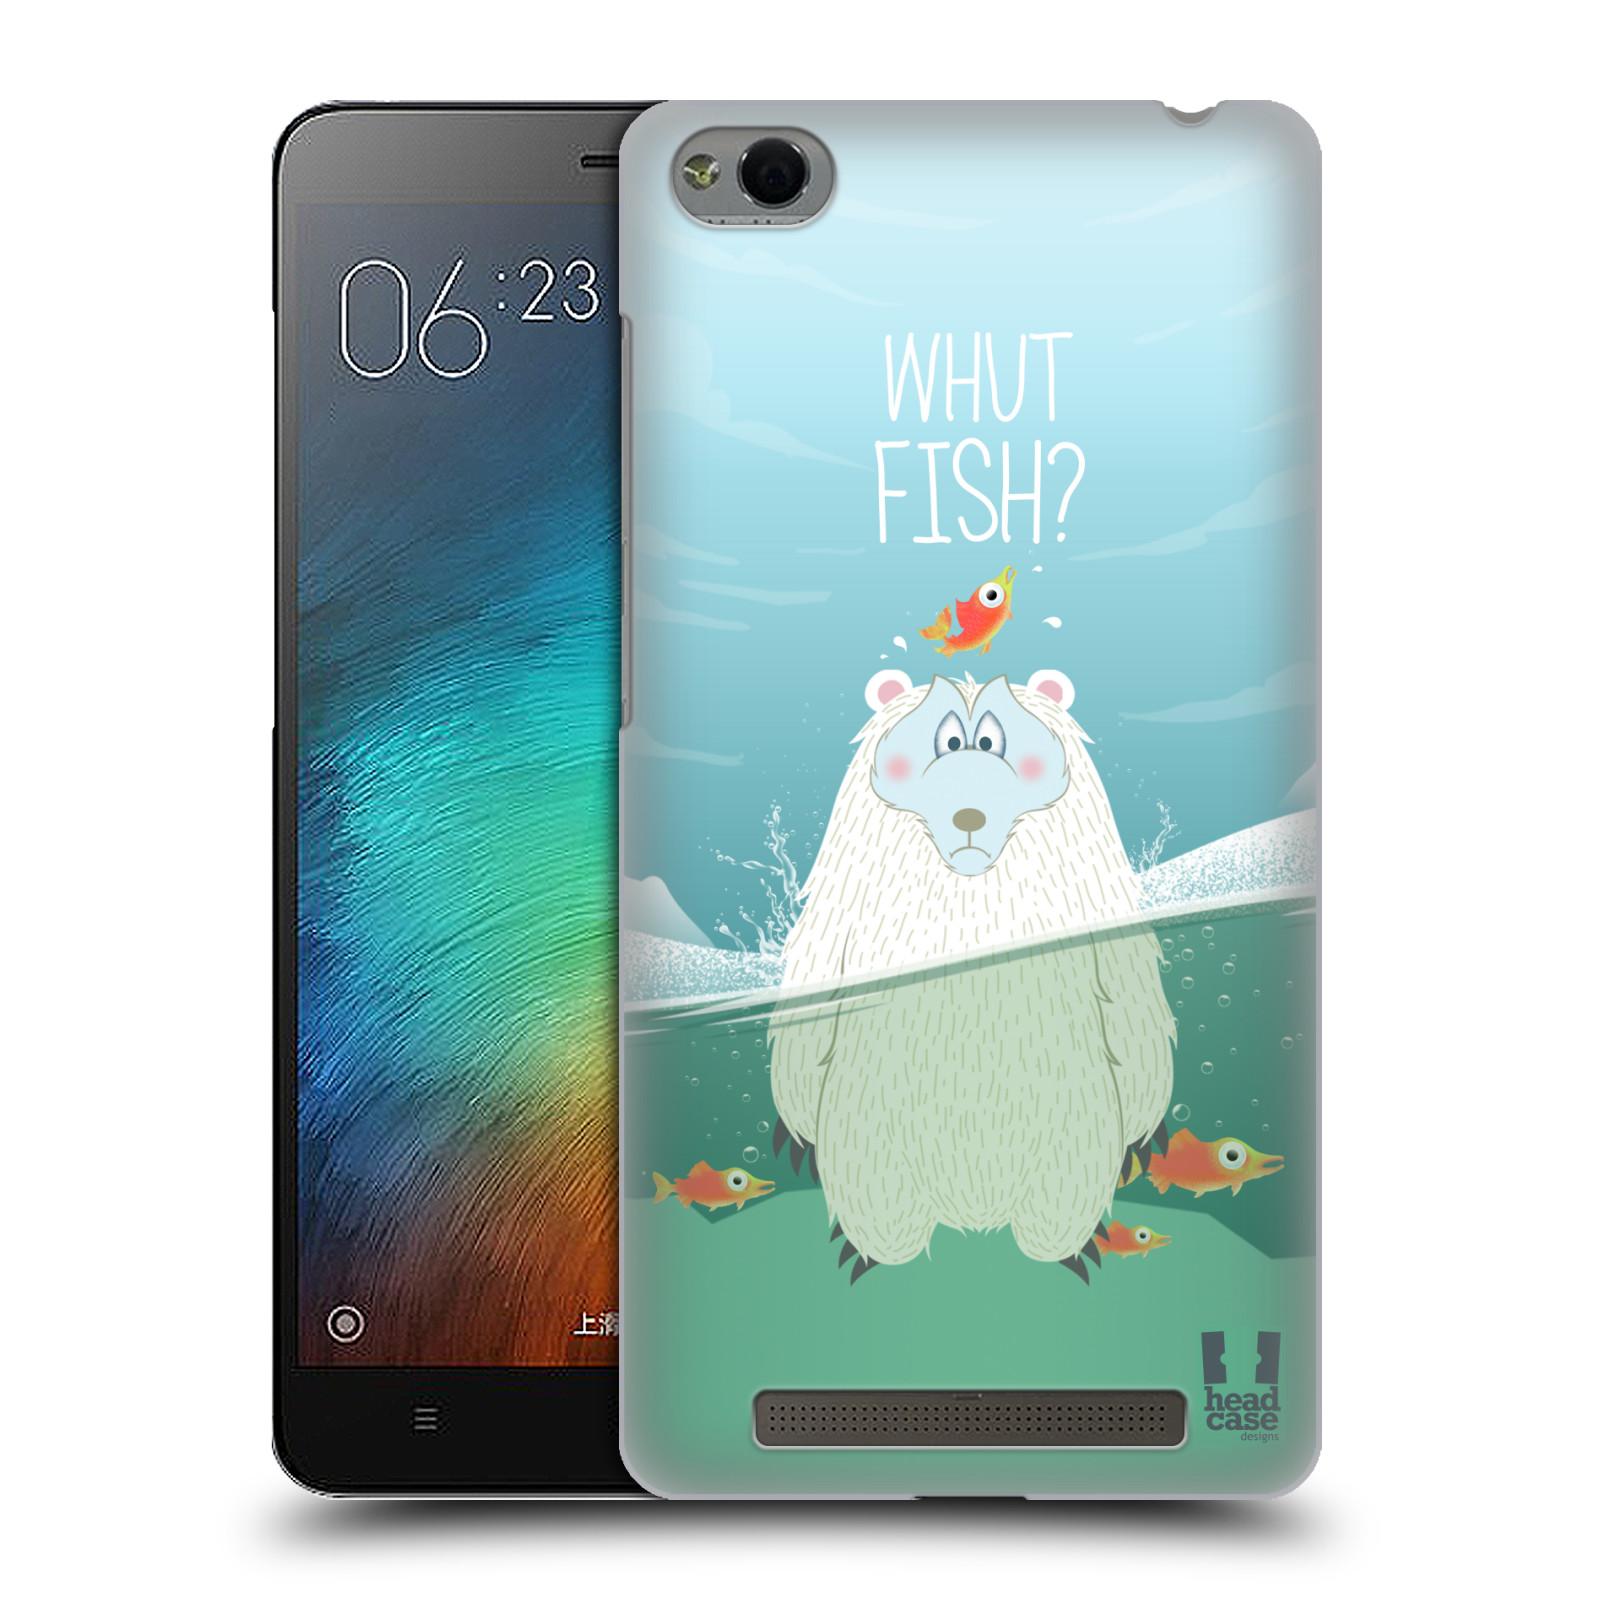 Plastové pouzdro na mobil Xiaomi Redmi 3 HEAD CASE Medvěd Whut Fish?